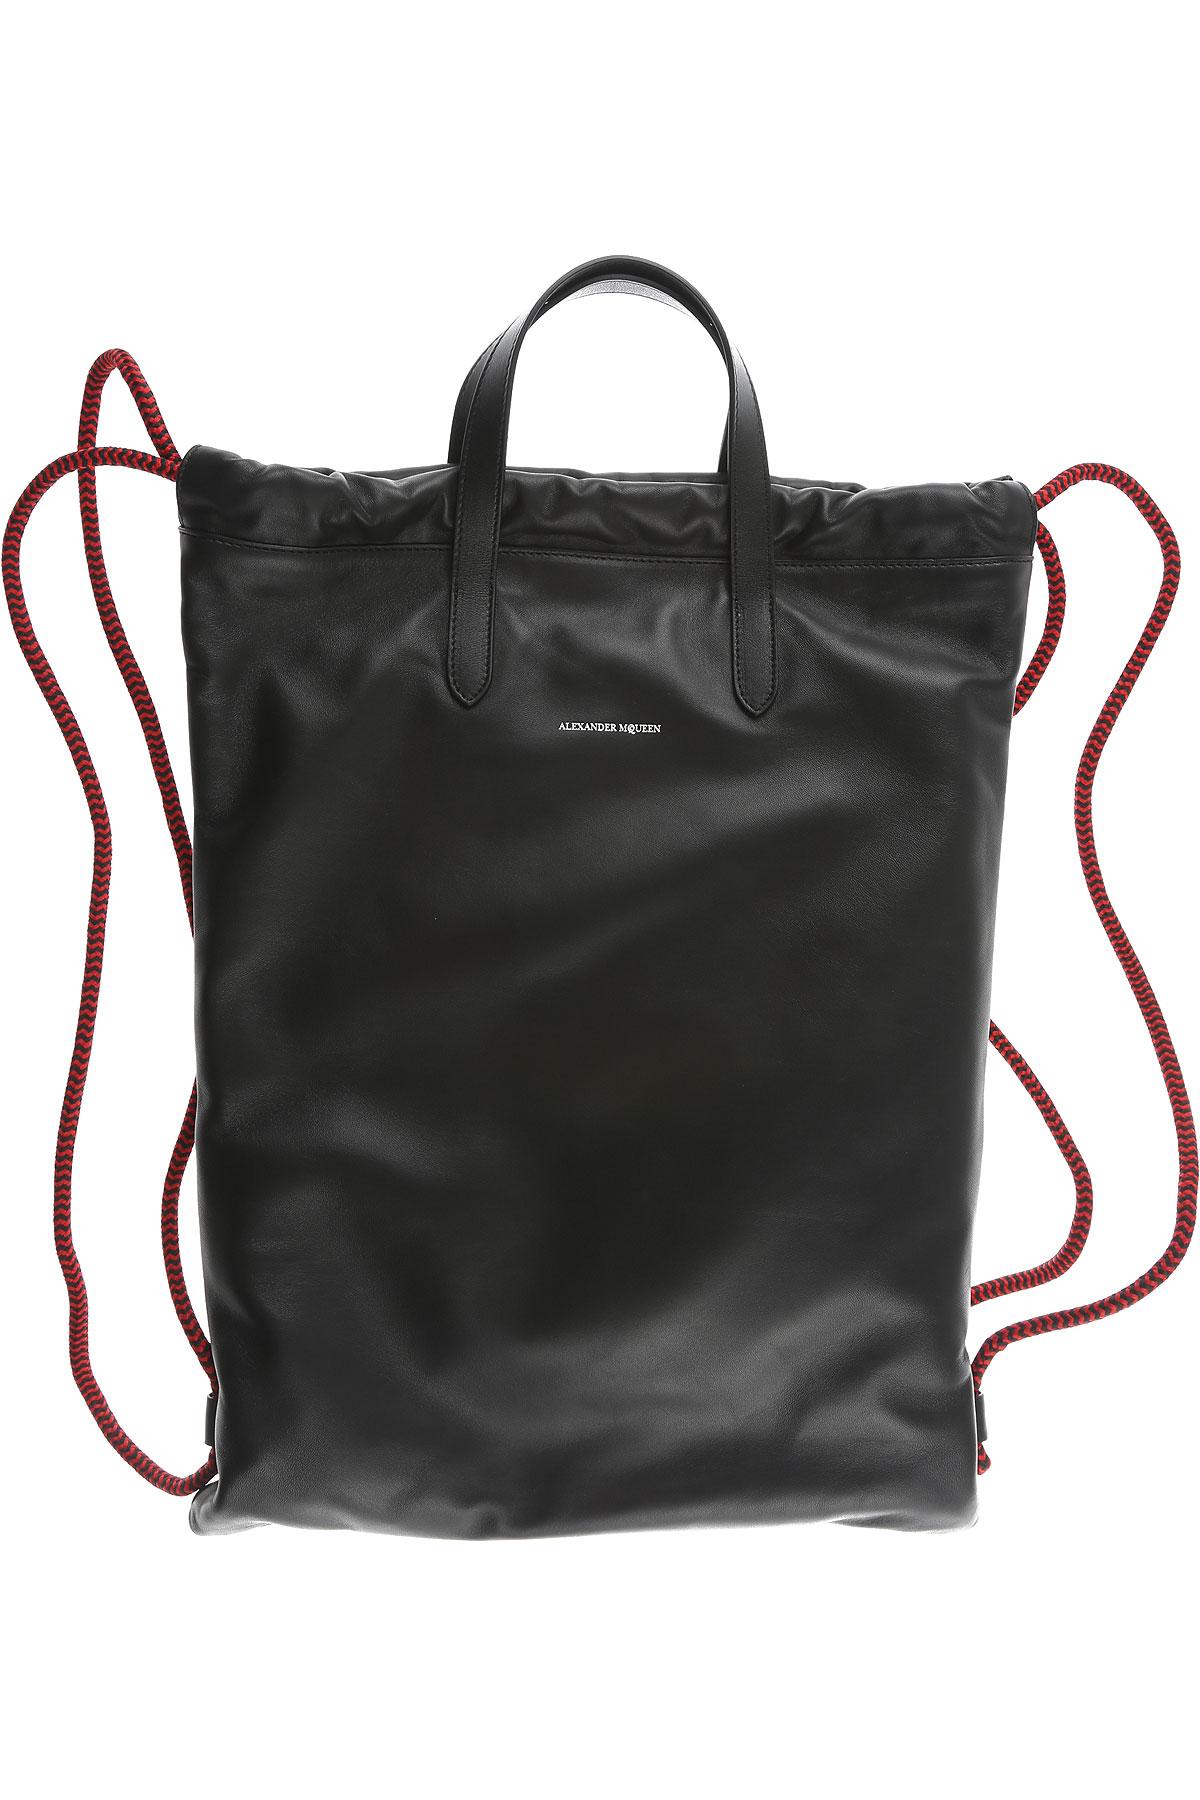 Image of Alexander McQueen Backpack for Men, Black, Leather, 2017